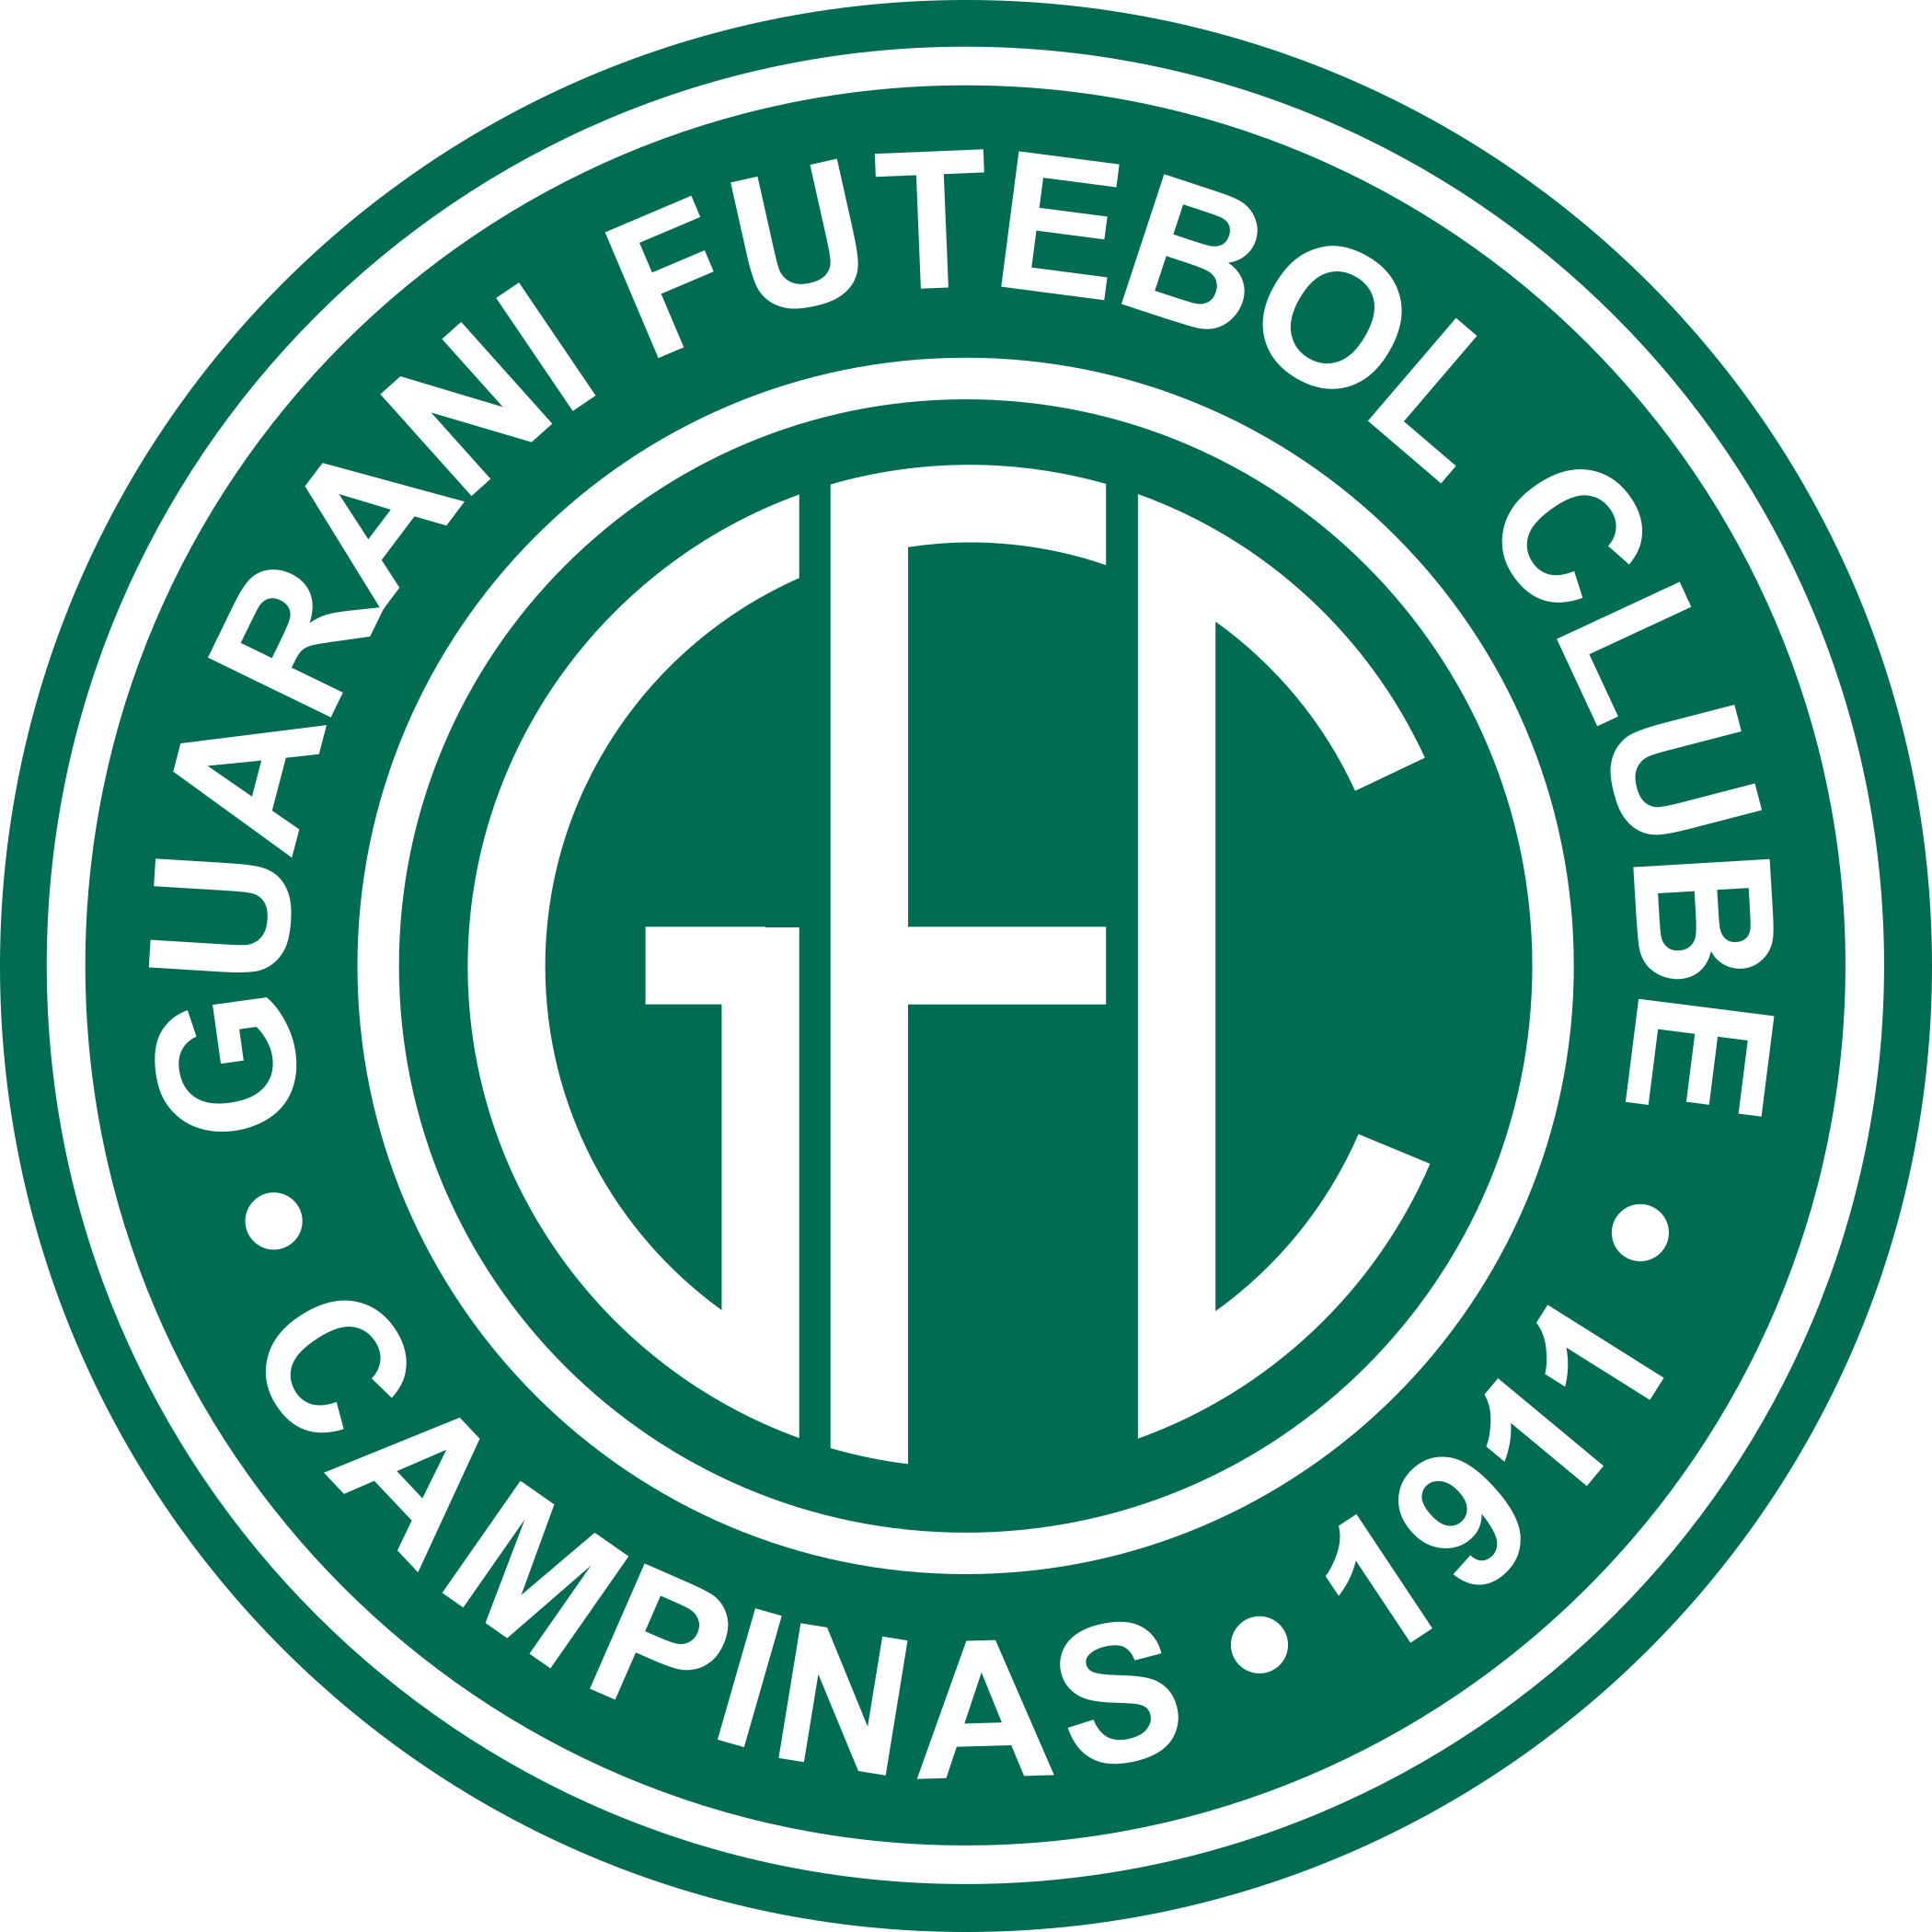 Guarani fc logo esudo 3 - Guarani FC Logo - Brasil